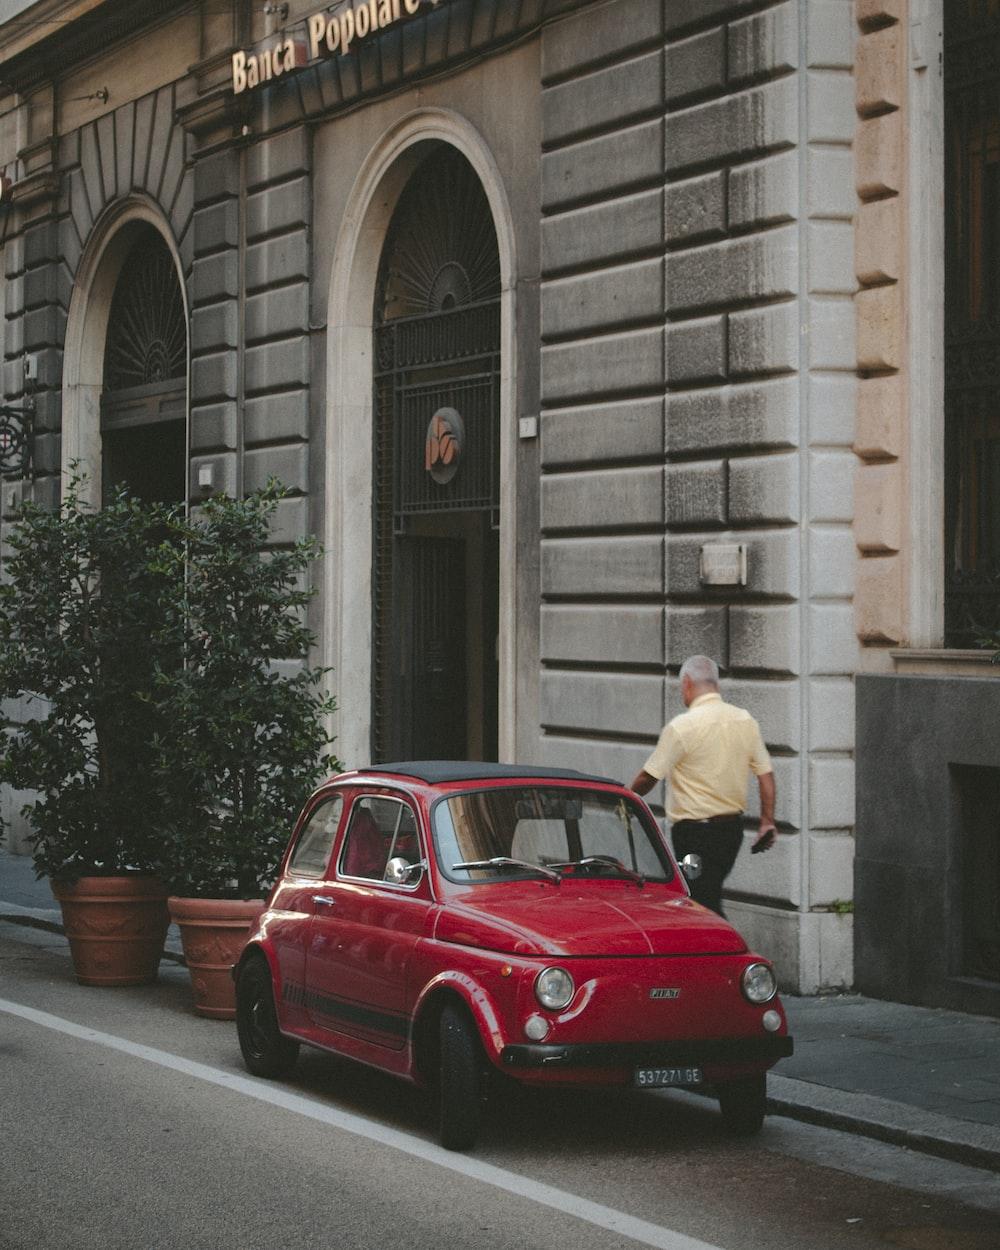 red 3-door hatchback parked on the street